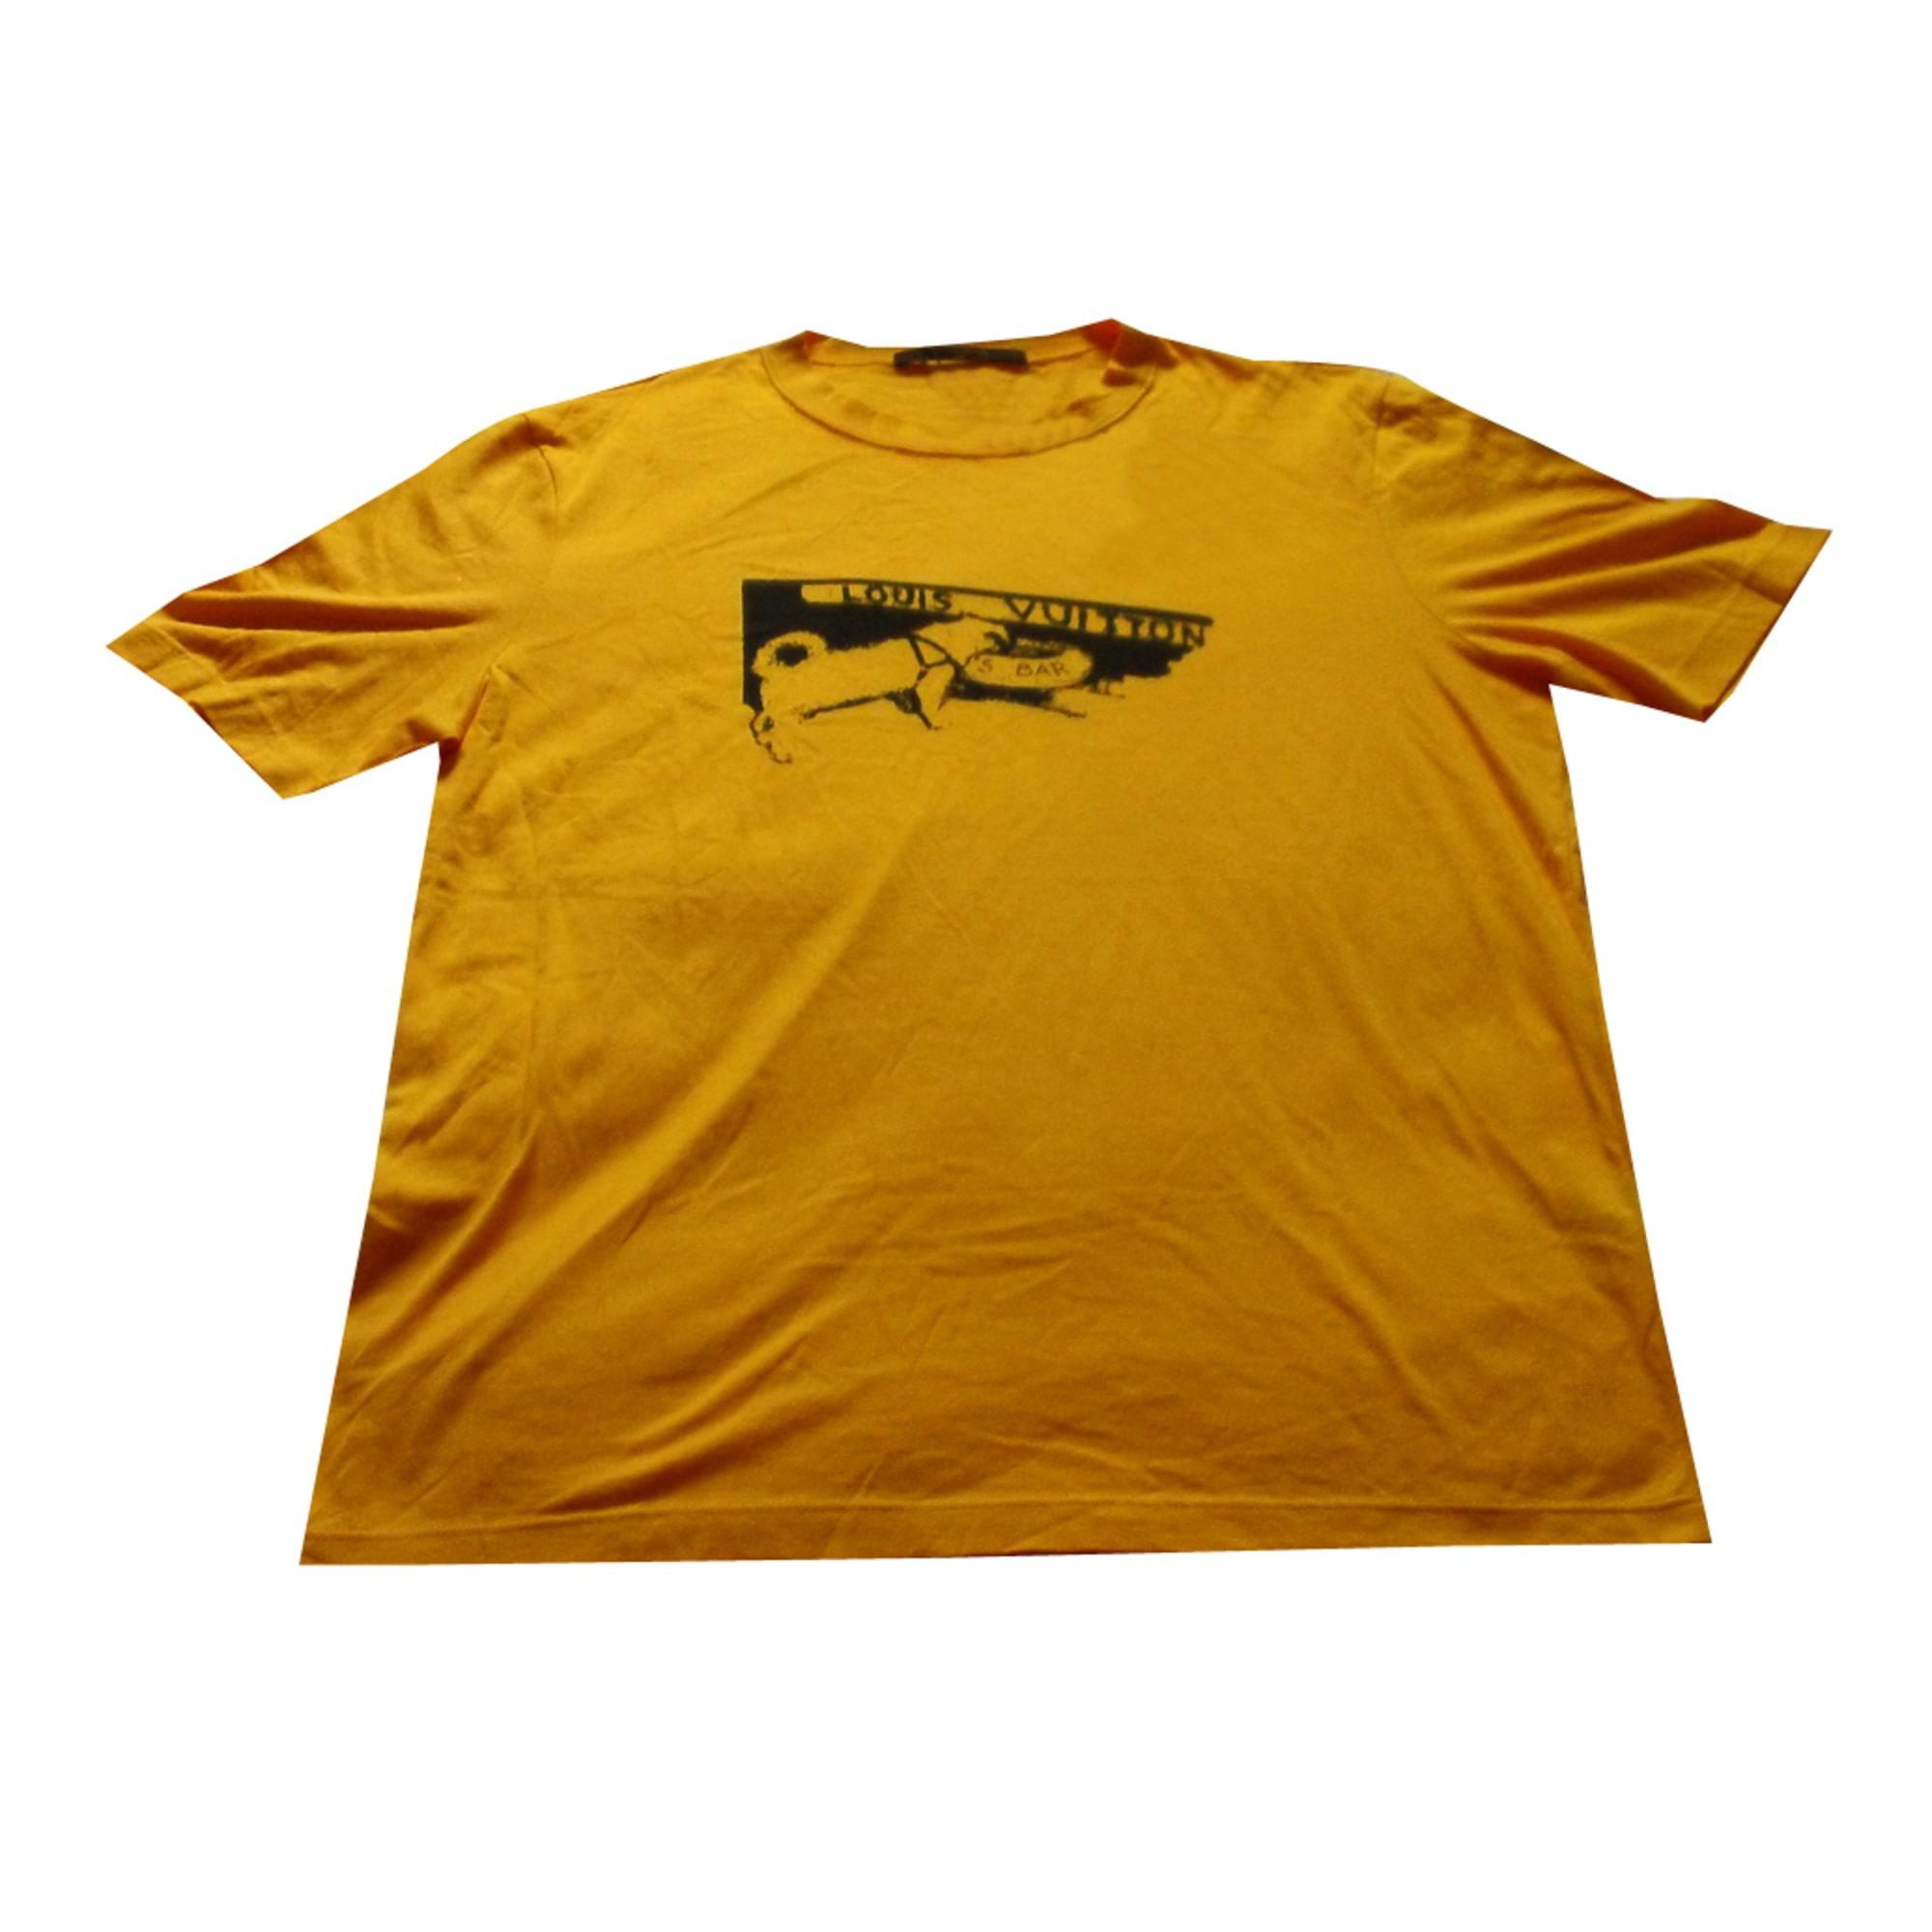 1bff85f8df37 Tee-shirt LOUIS VUITTON 2 (M) jaune - 1065810